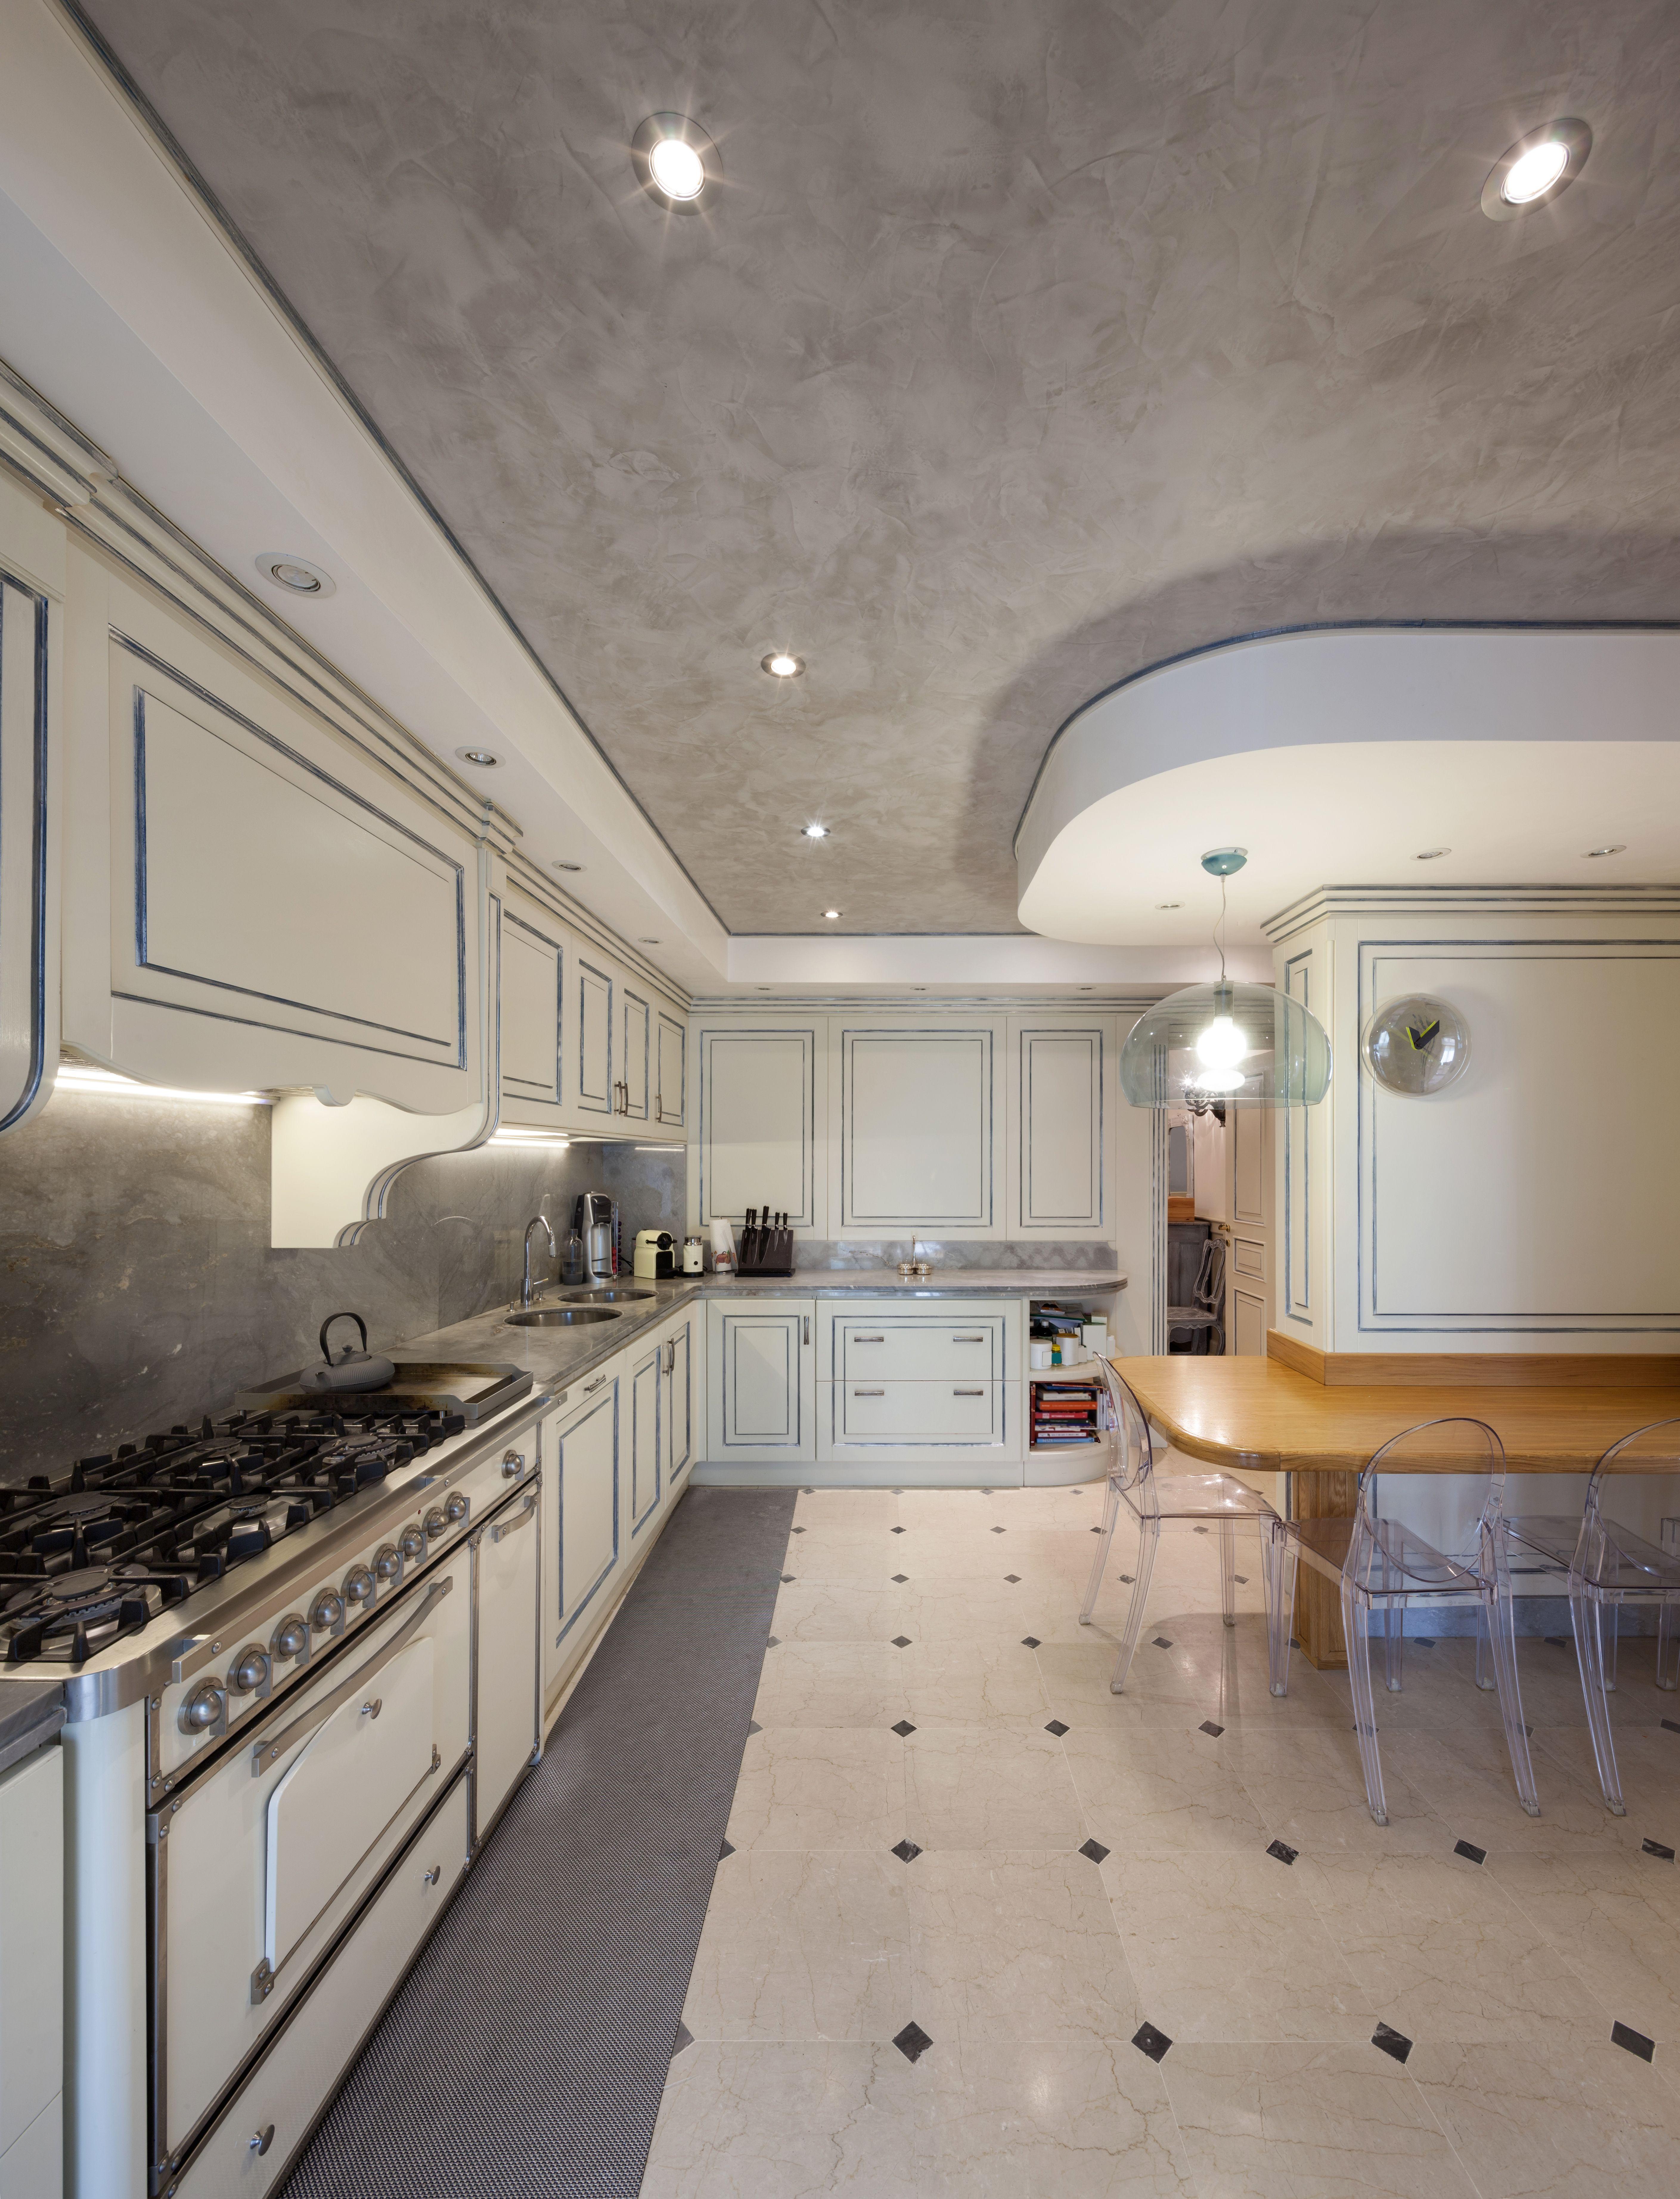 Antiqued And Glazed Lacquer Finish Refinishing Cabinets Painting Kitchen Cabinets Kitchen Cabinets